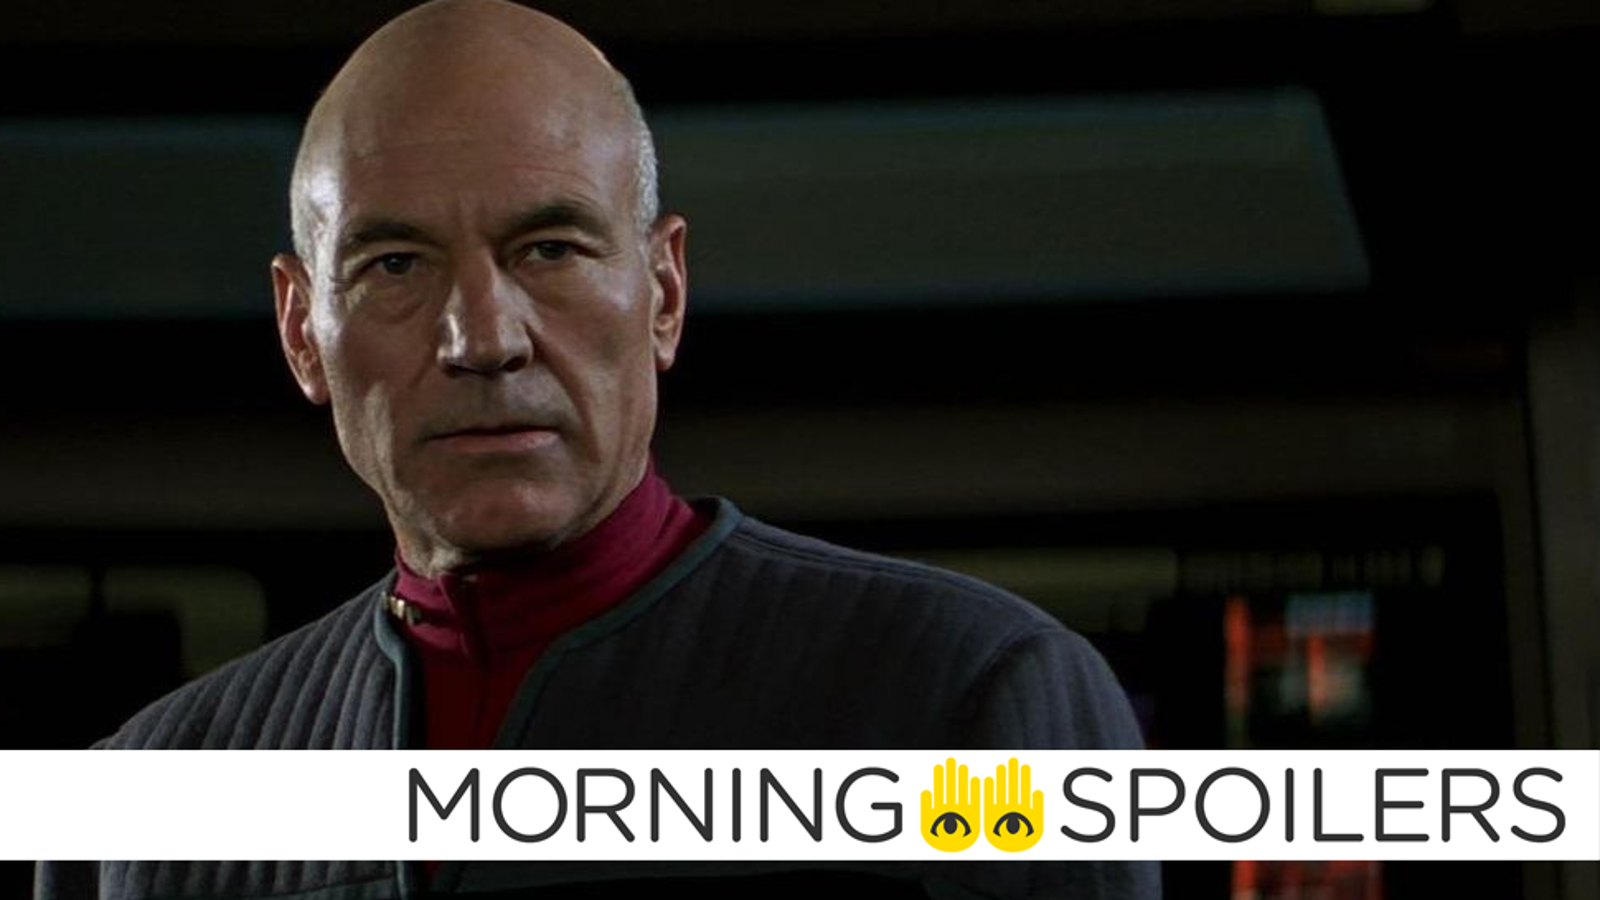 More Rumors About Patrick Stewart's Potential Return to Star Trek